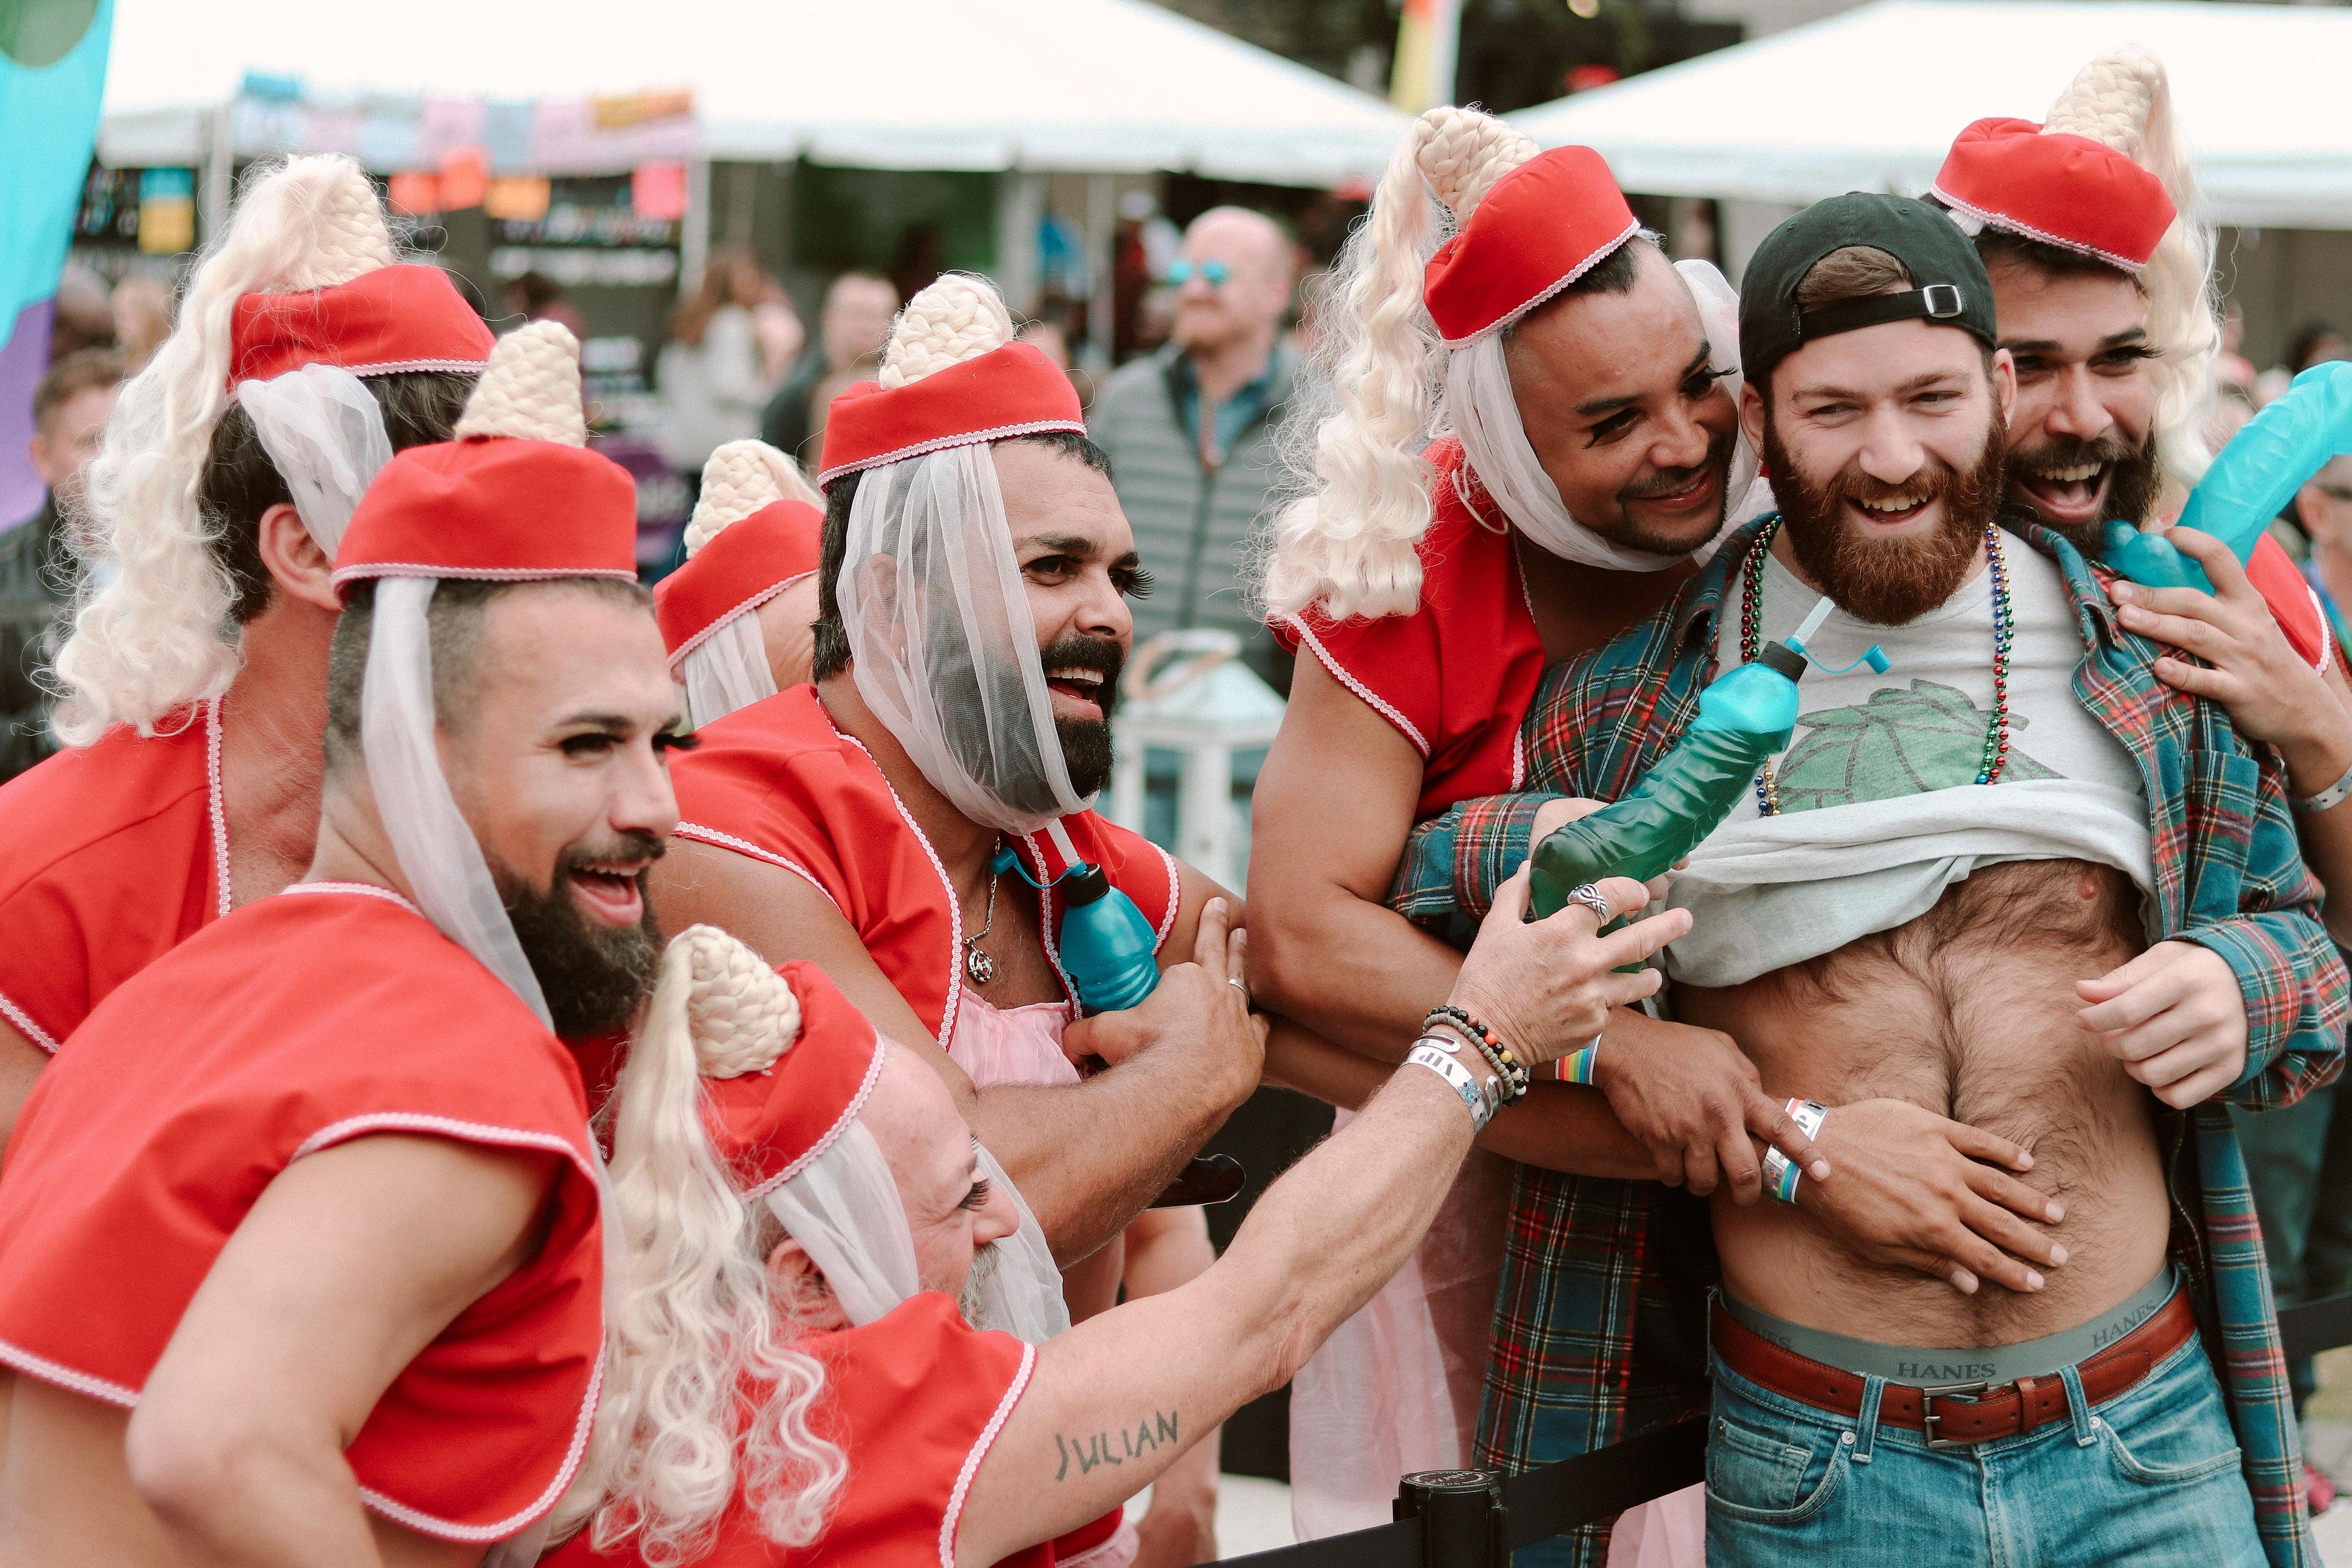 Spokane gay bars and nightlife guide